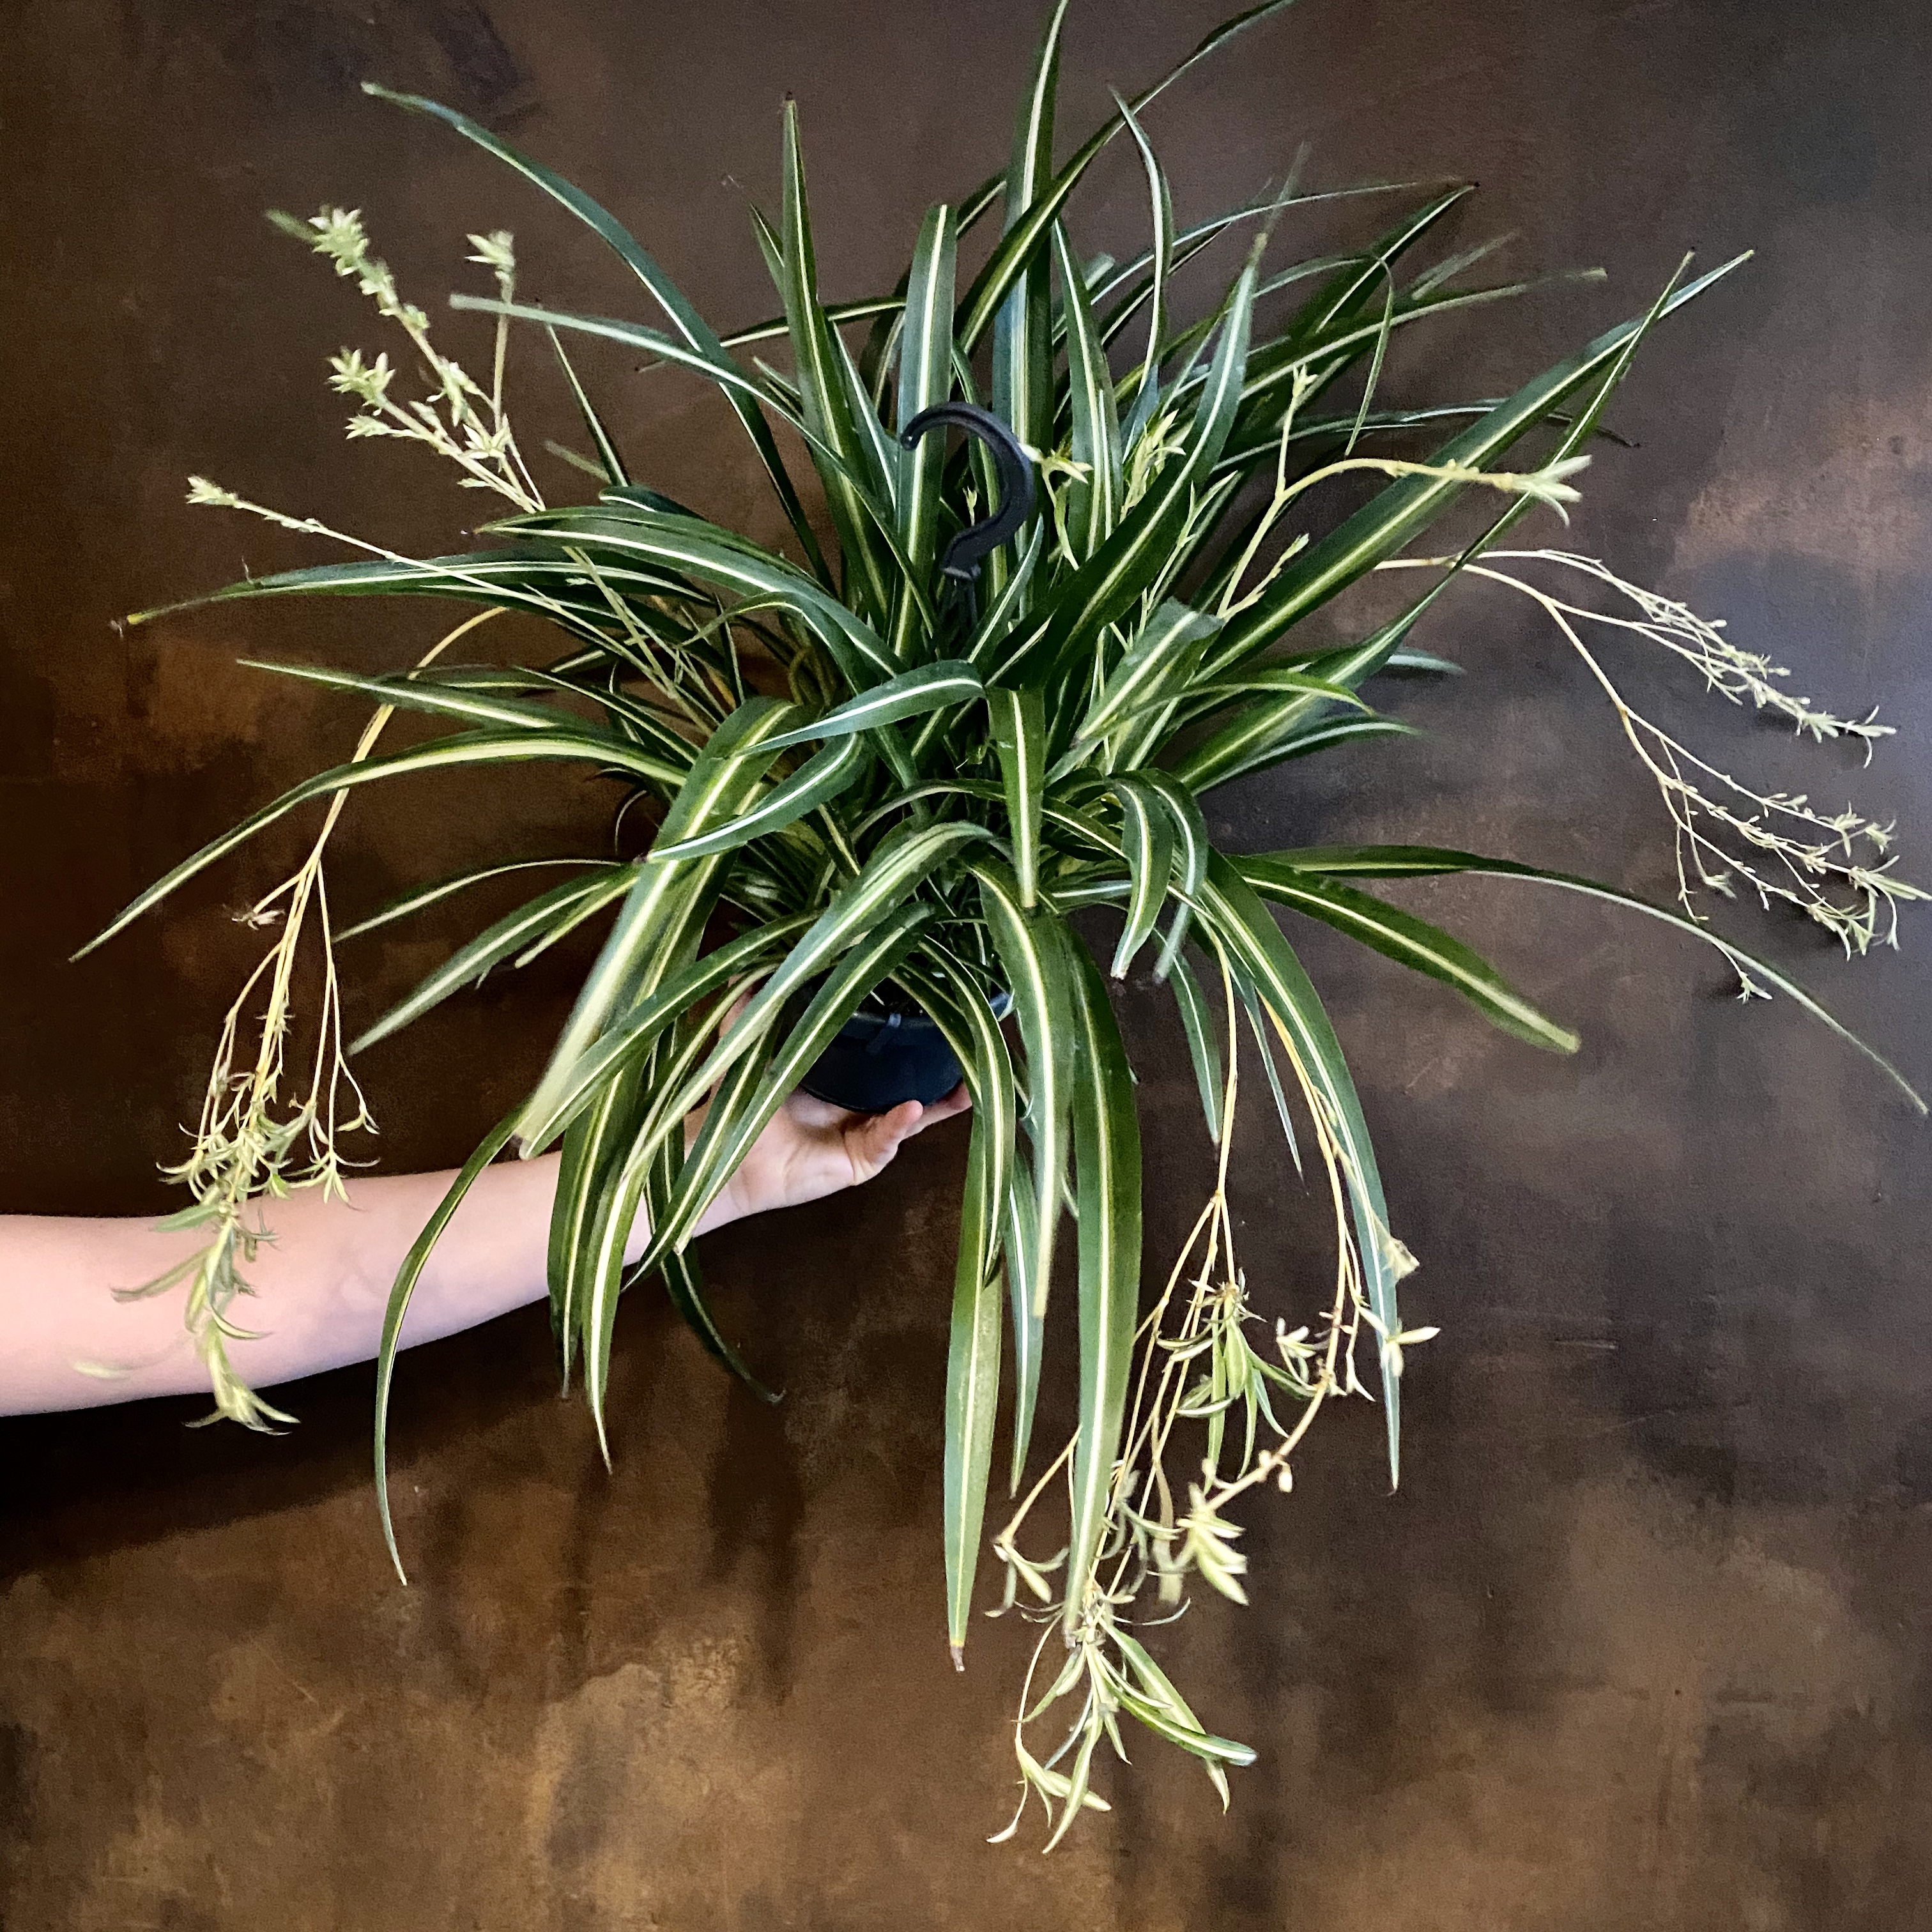 Chlorophytum 'Variegatum' (hangpot)